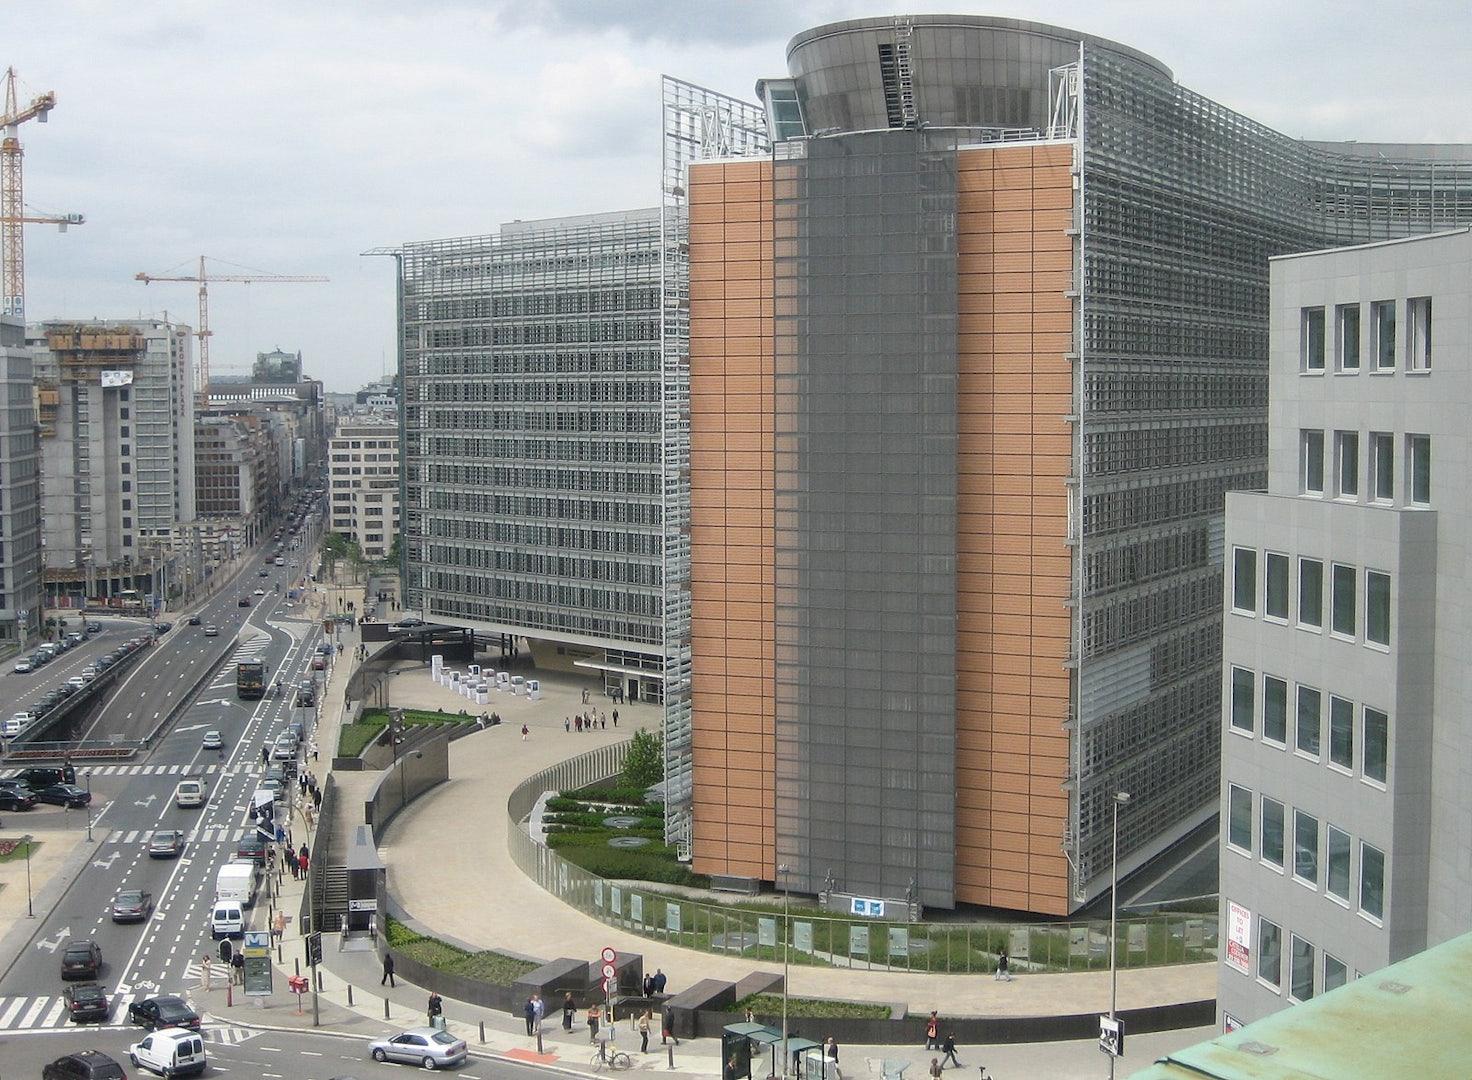 Brussels - Berlaymont building